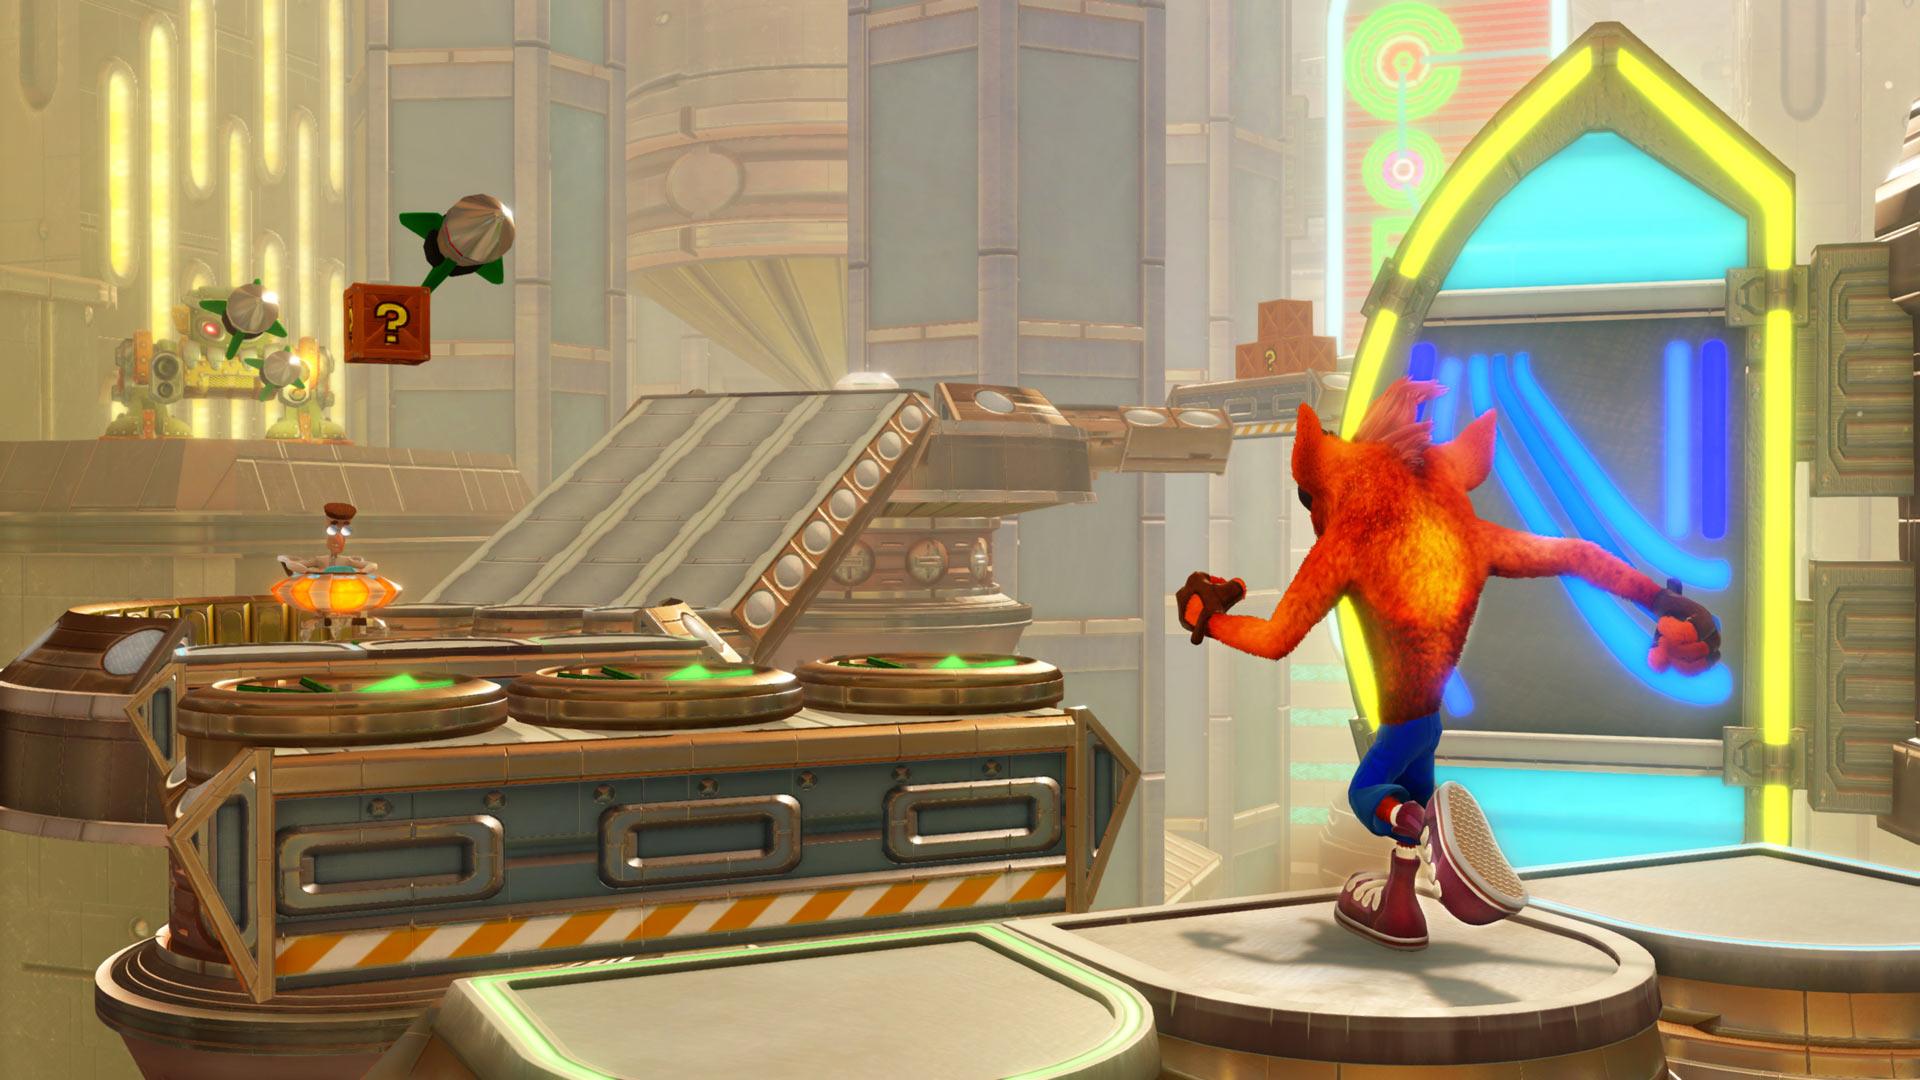 Скриншот №3 к Crash Bandicoot N. Sane Trilogy - эпизод Future Tense